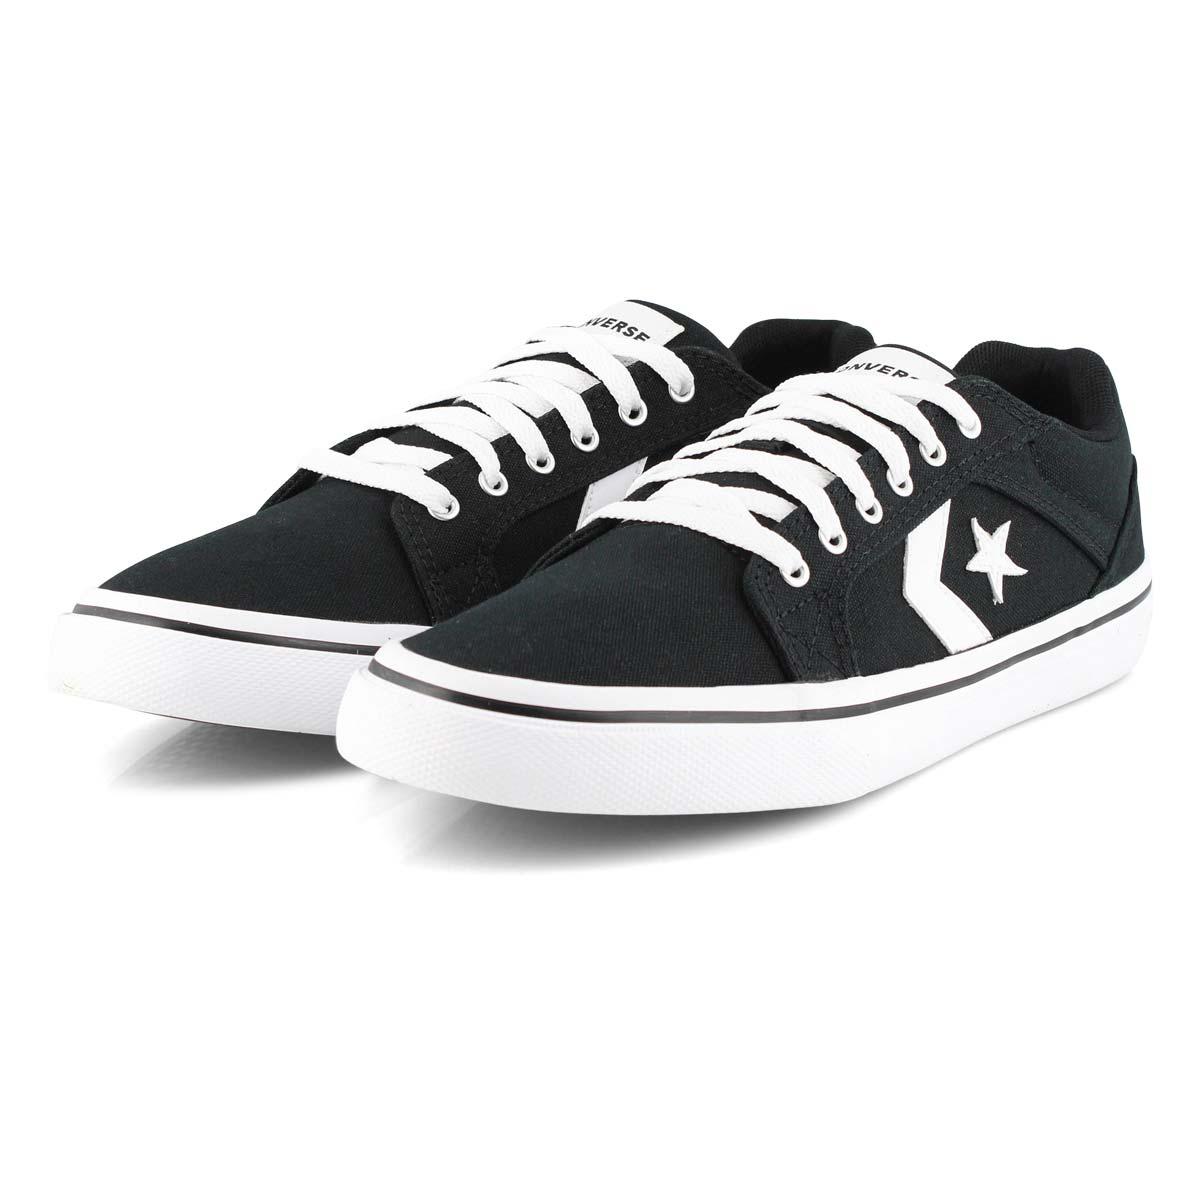 Men's EL Distrito 2.0 Sneaker - Black/White